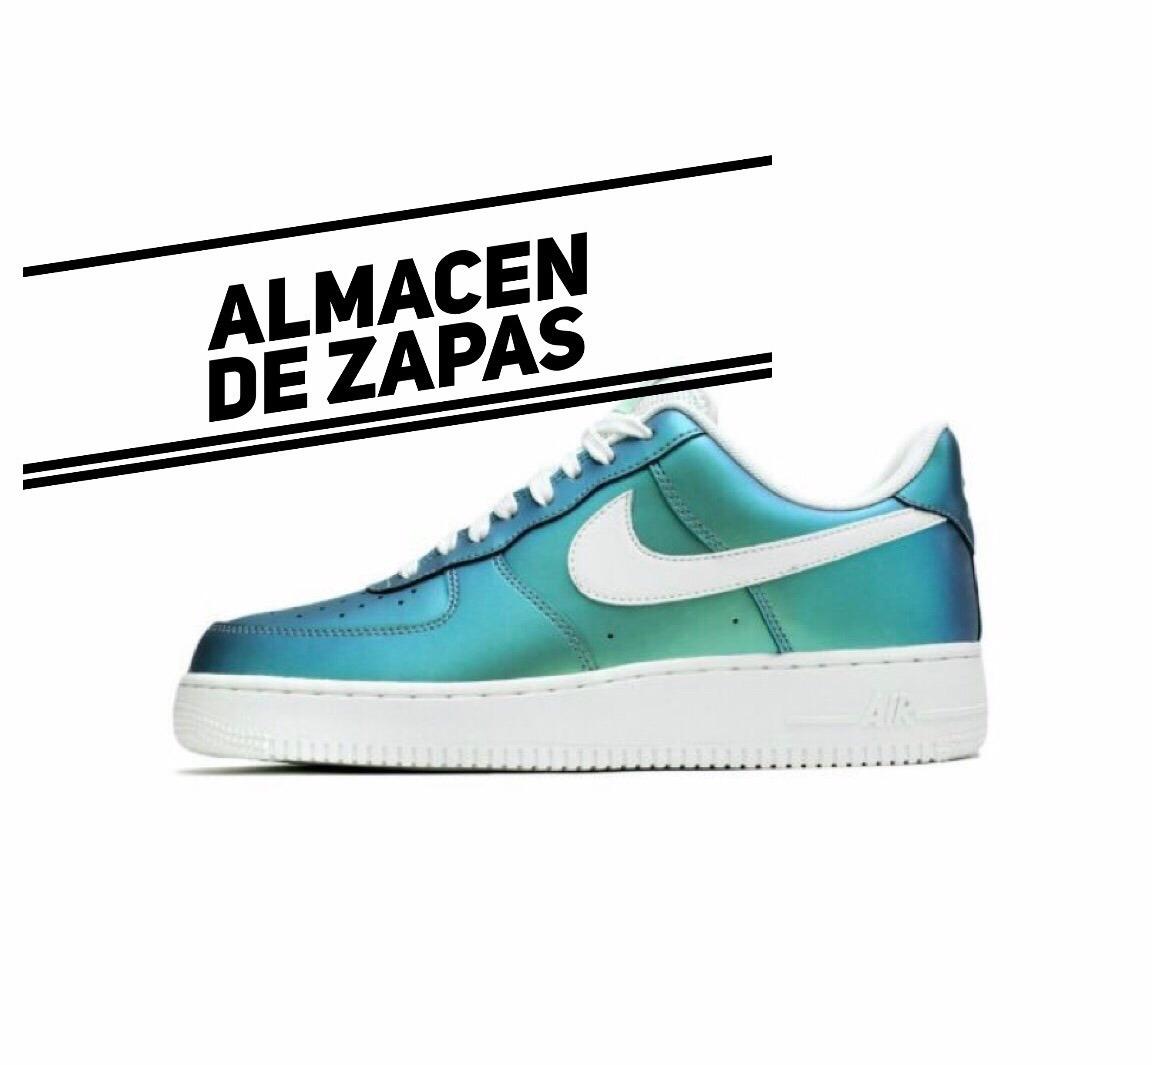 Fresh Pedido Nike Force Mint 1 Zapatillasmodelo A Air Low QsdxhBrCt